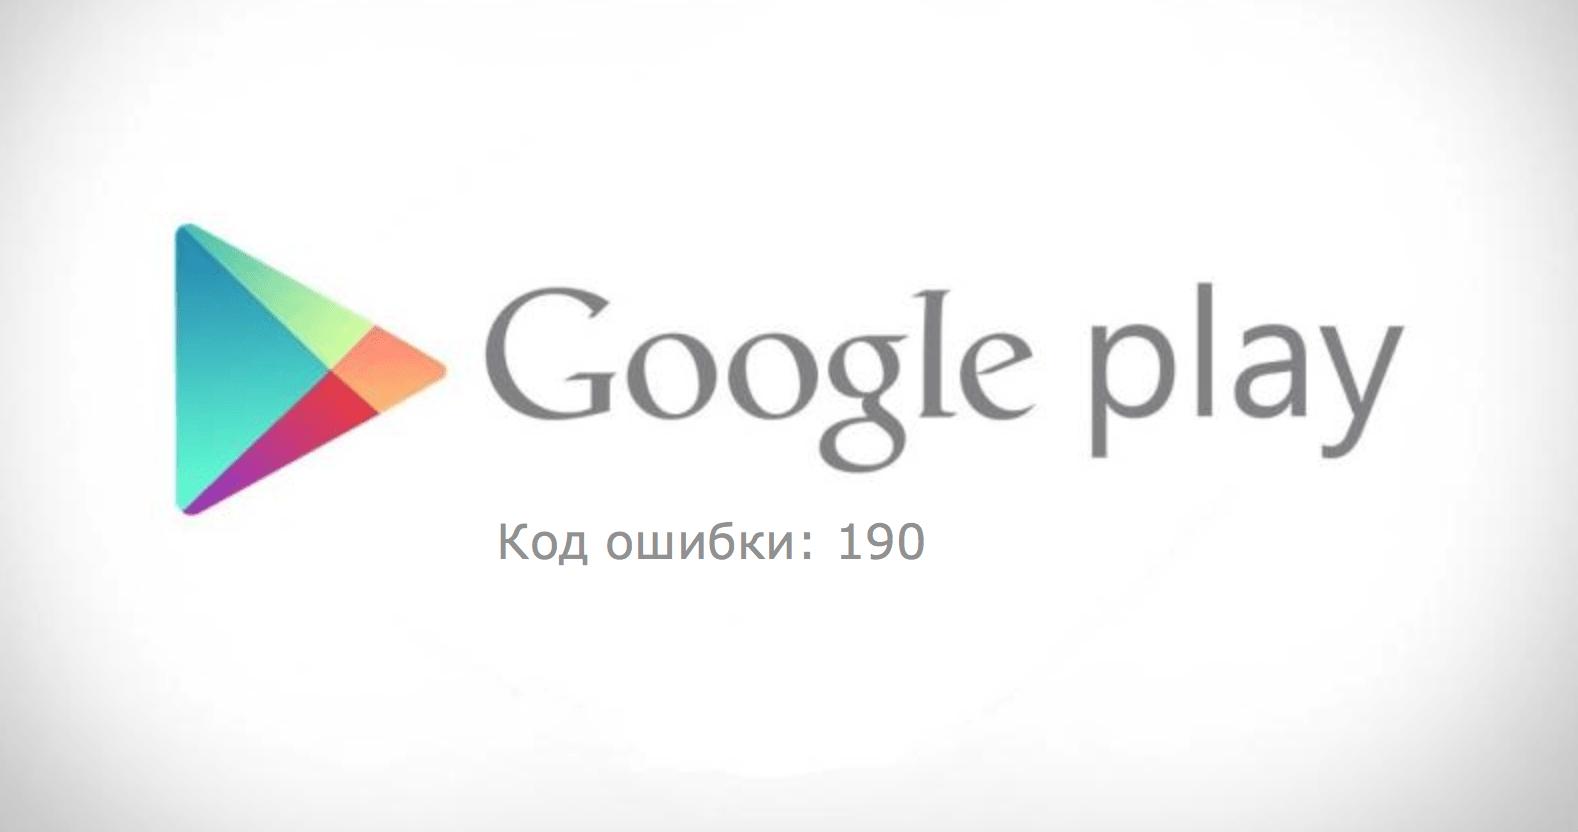 Код ошибки 190 в Google Play